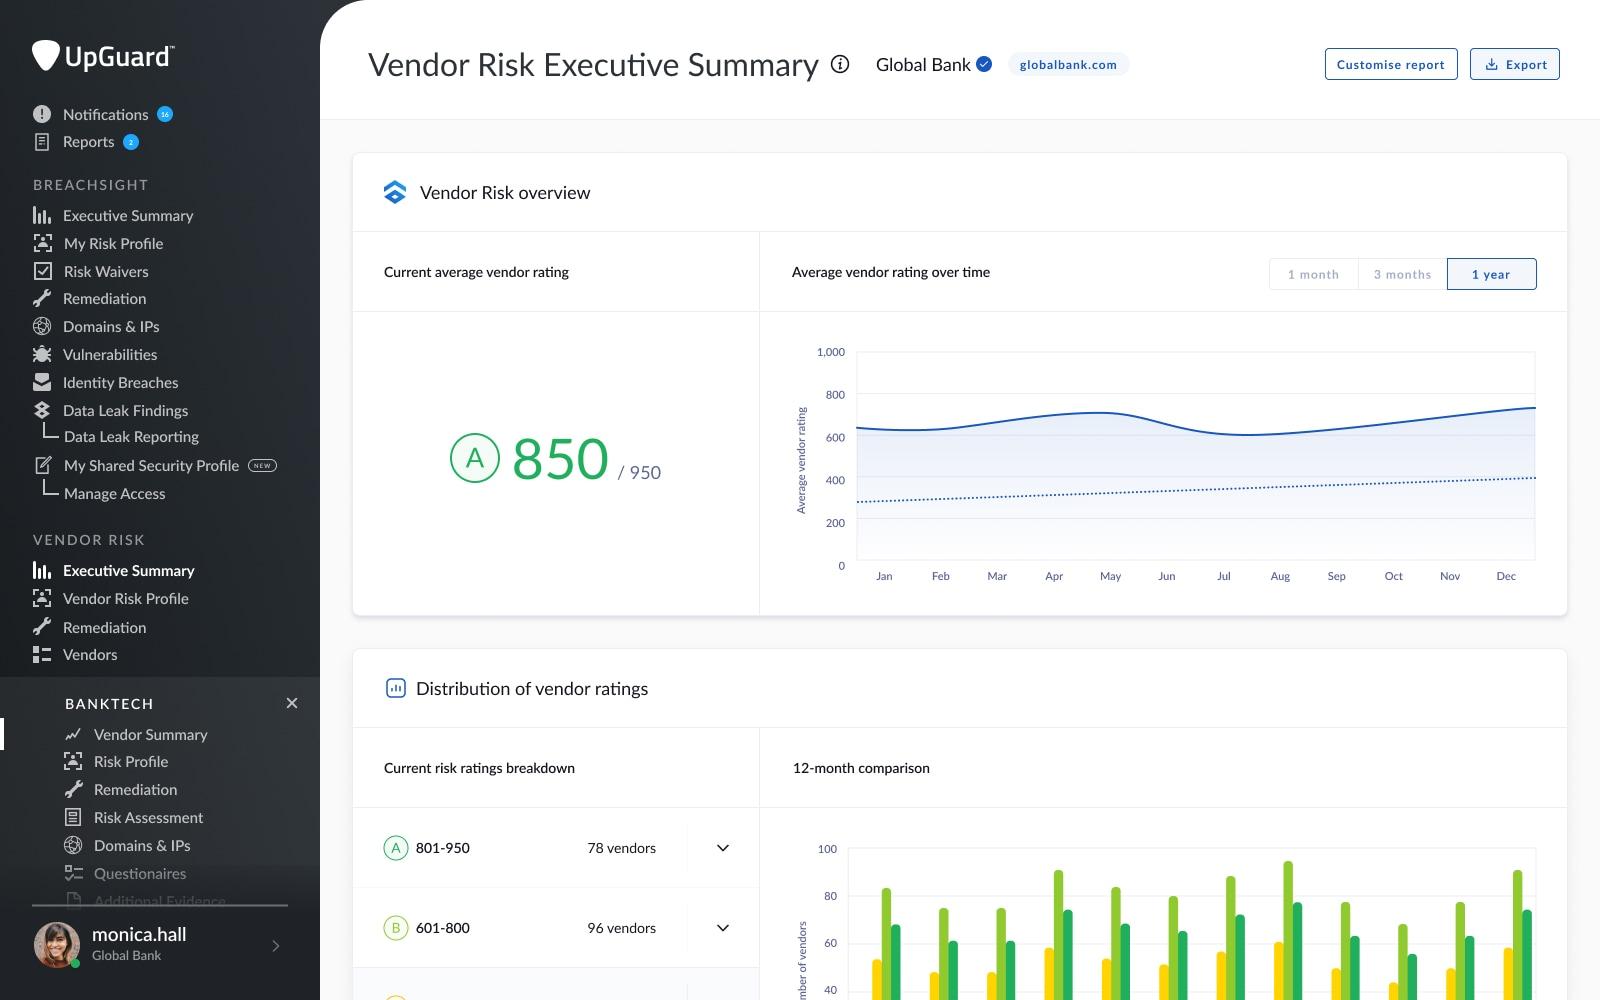 UpGuard Vendor Risk Customer